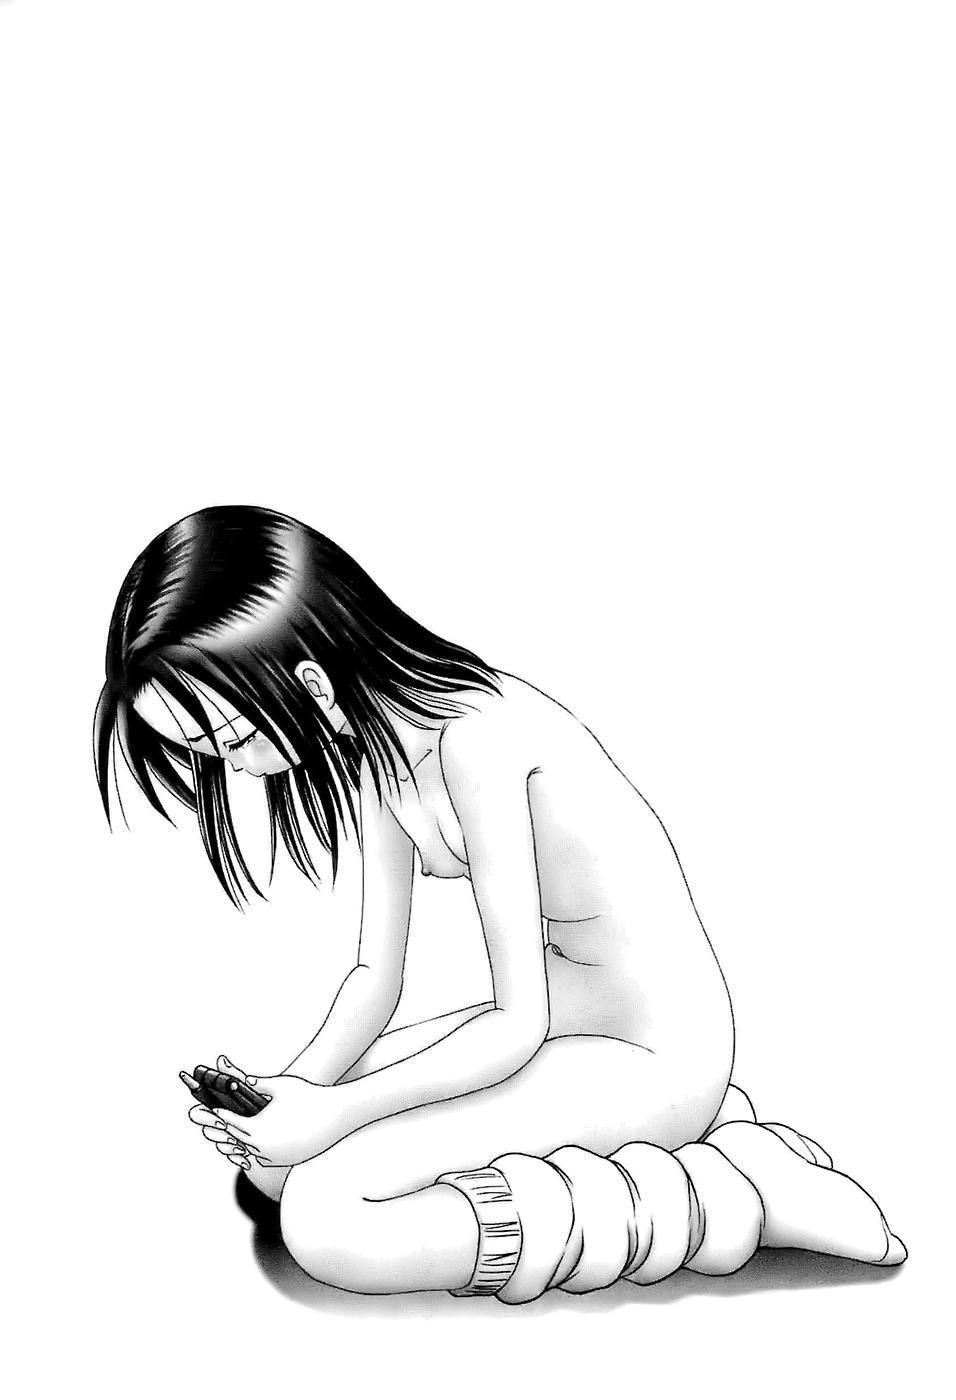 [Bow Rei] Osanai Kajitsu -Inkou Shougakusei no Houkago- Jou 127